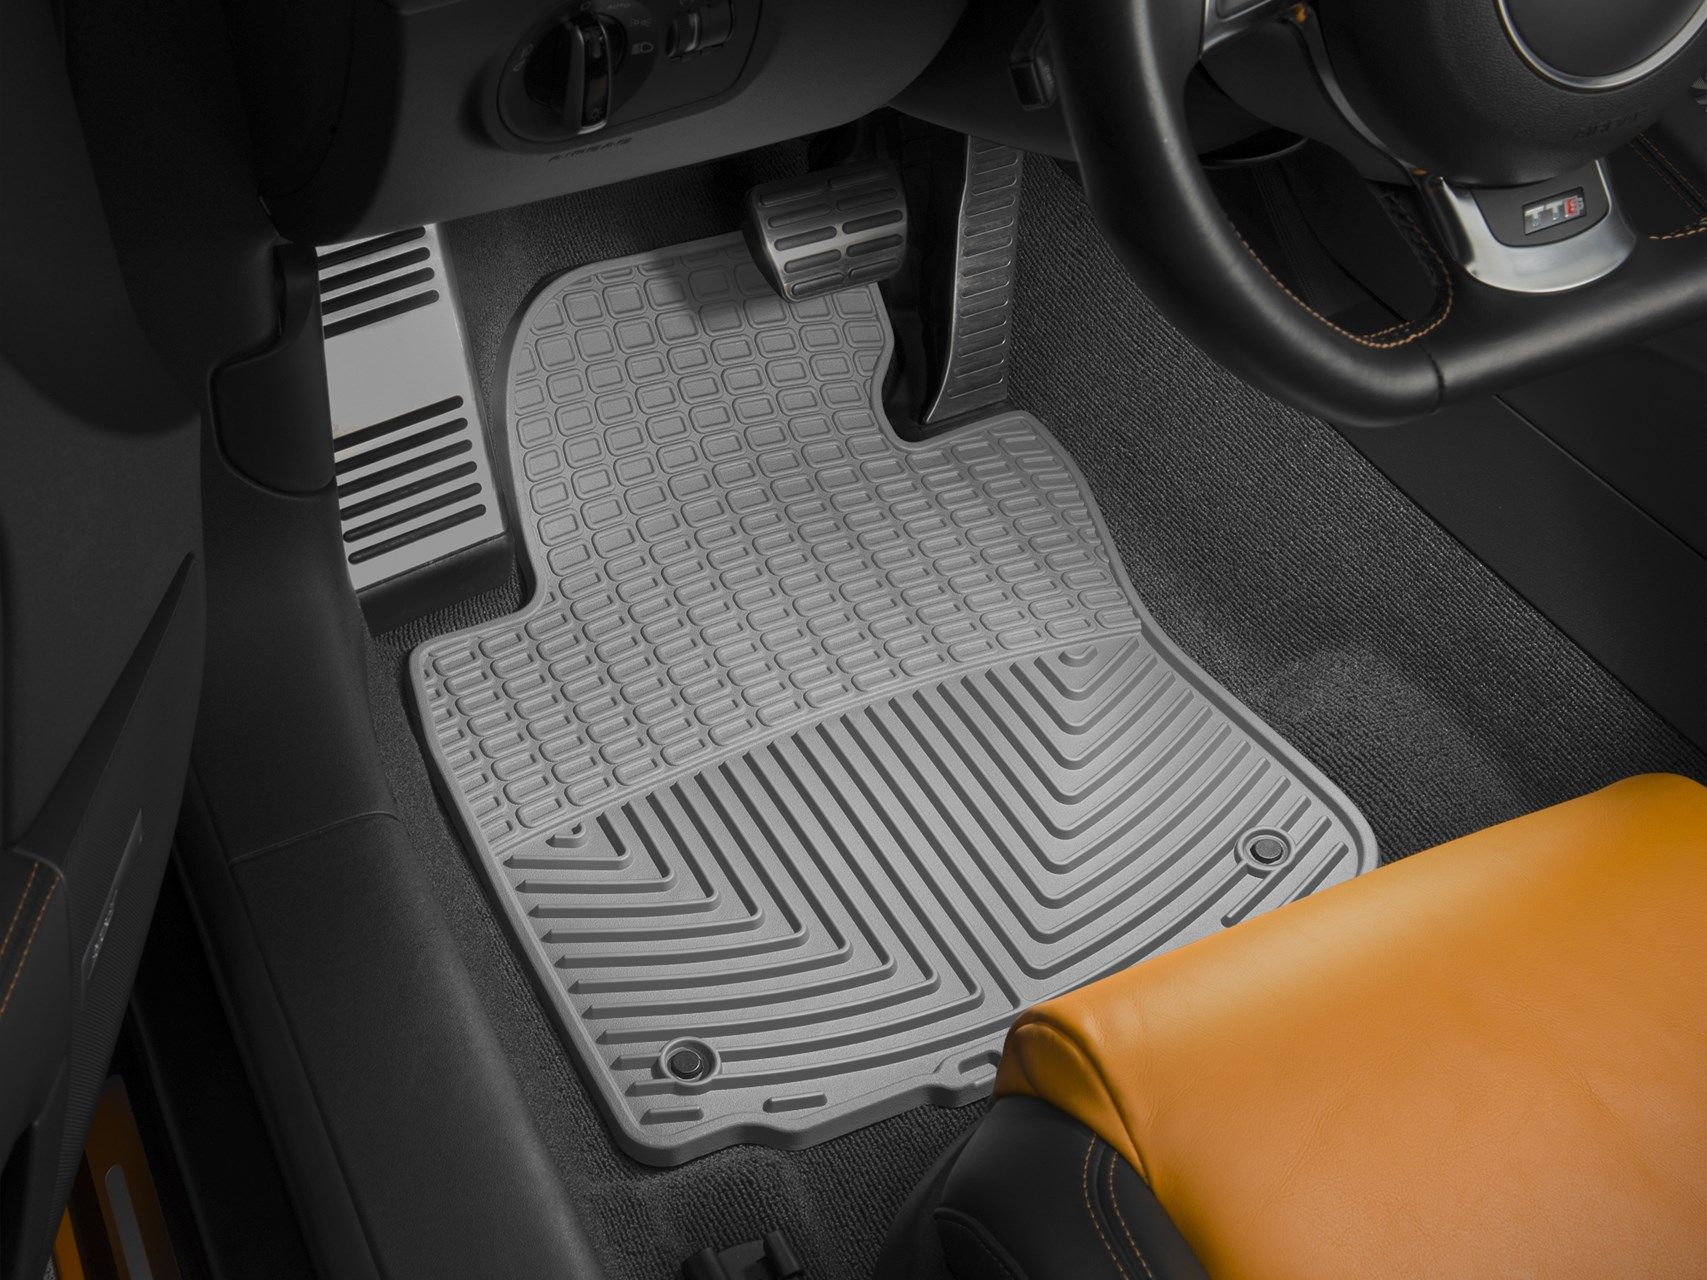 2013 Toyota Prius All Weather Car Mats All Season Flexible Rubber Floor Mats Weathertech Weather Tech Floor Mats Car Mats Weather Tech Mats